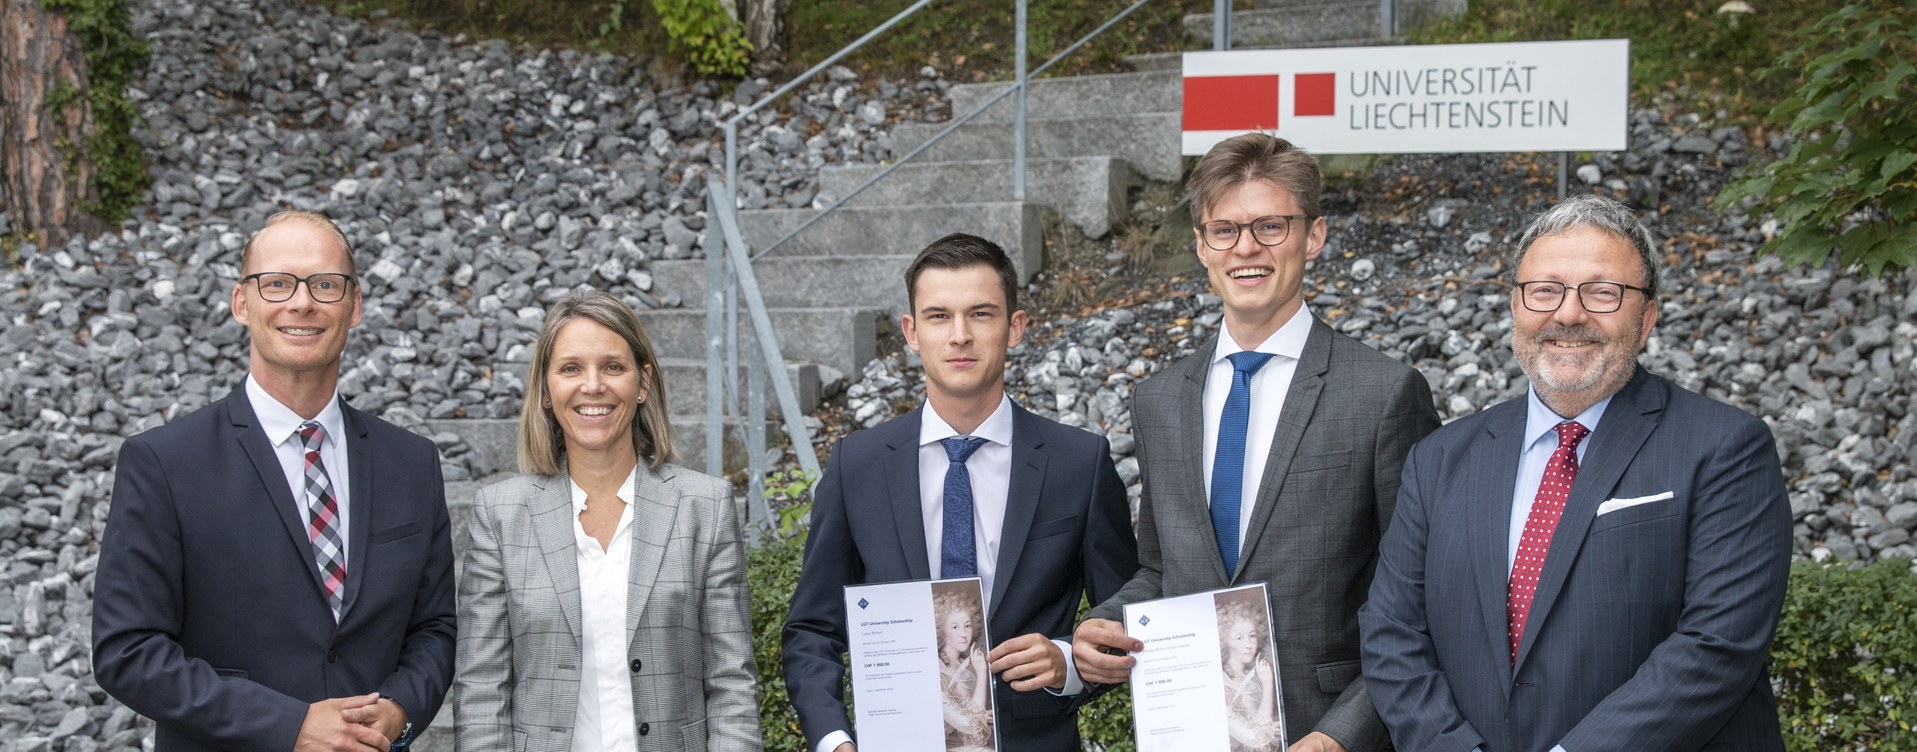 Philip Maximilian Daub und Luca Ritter erhalten LGT University Scholarship